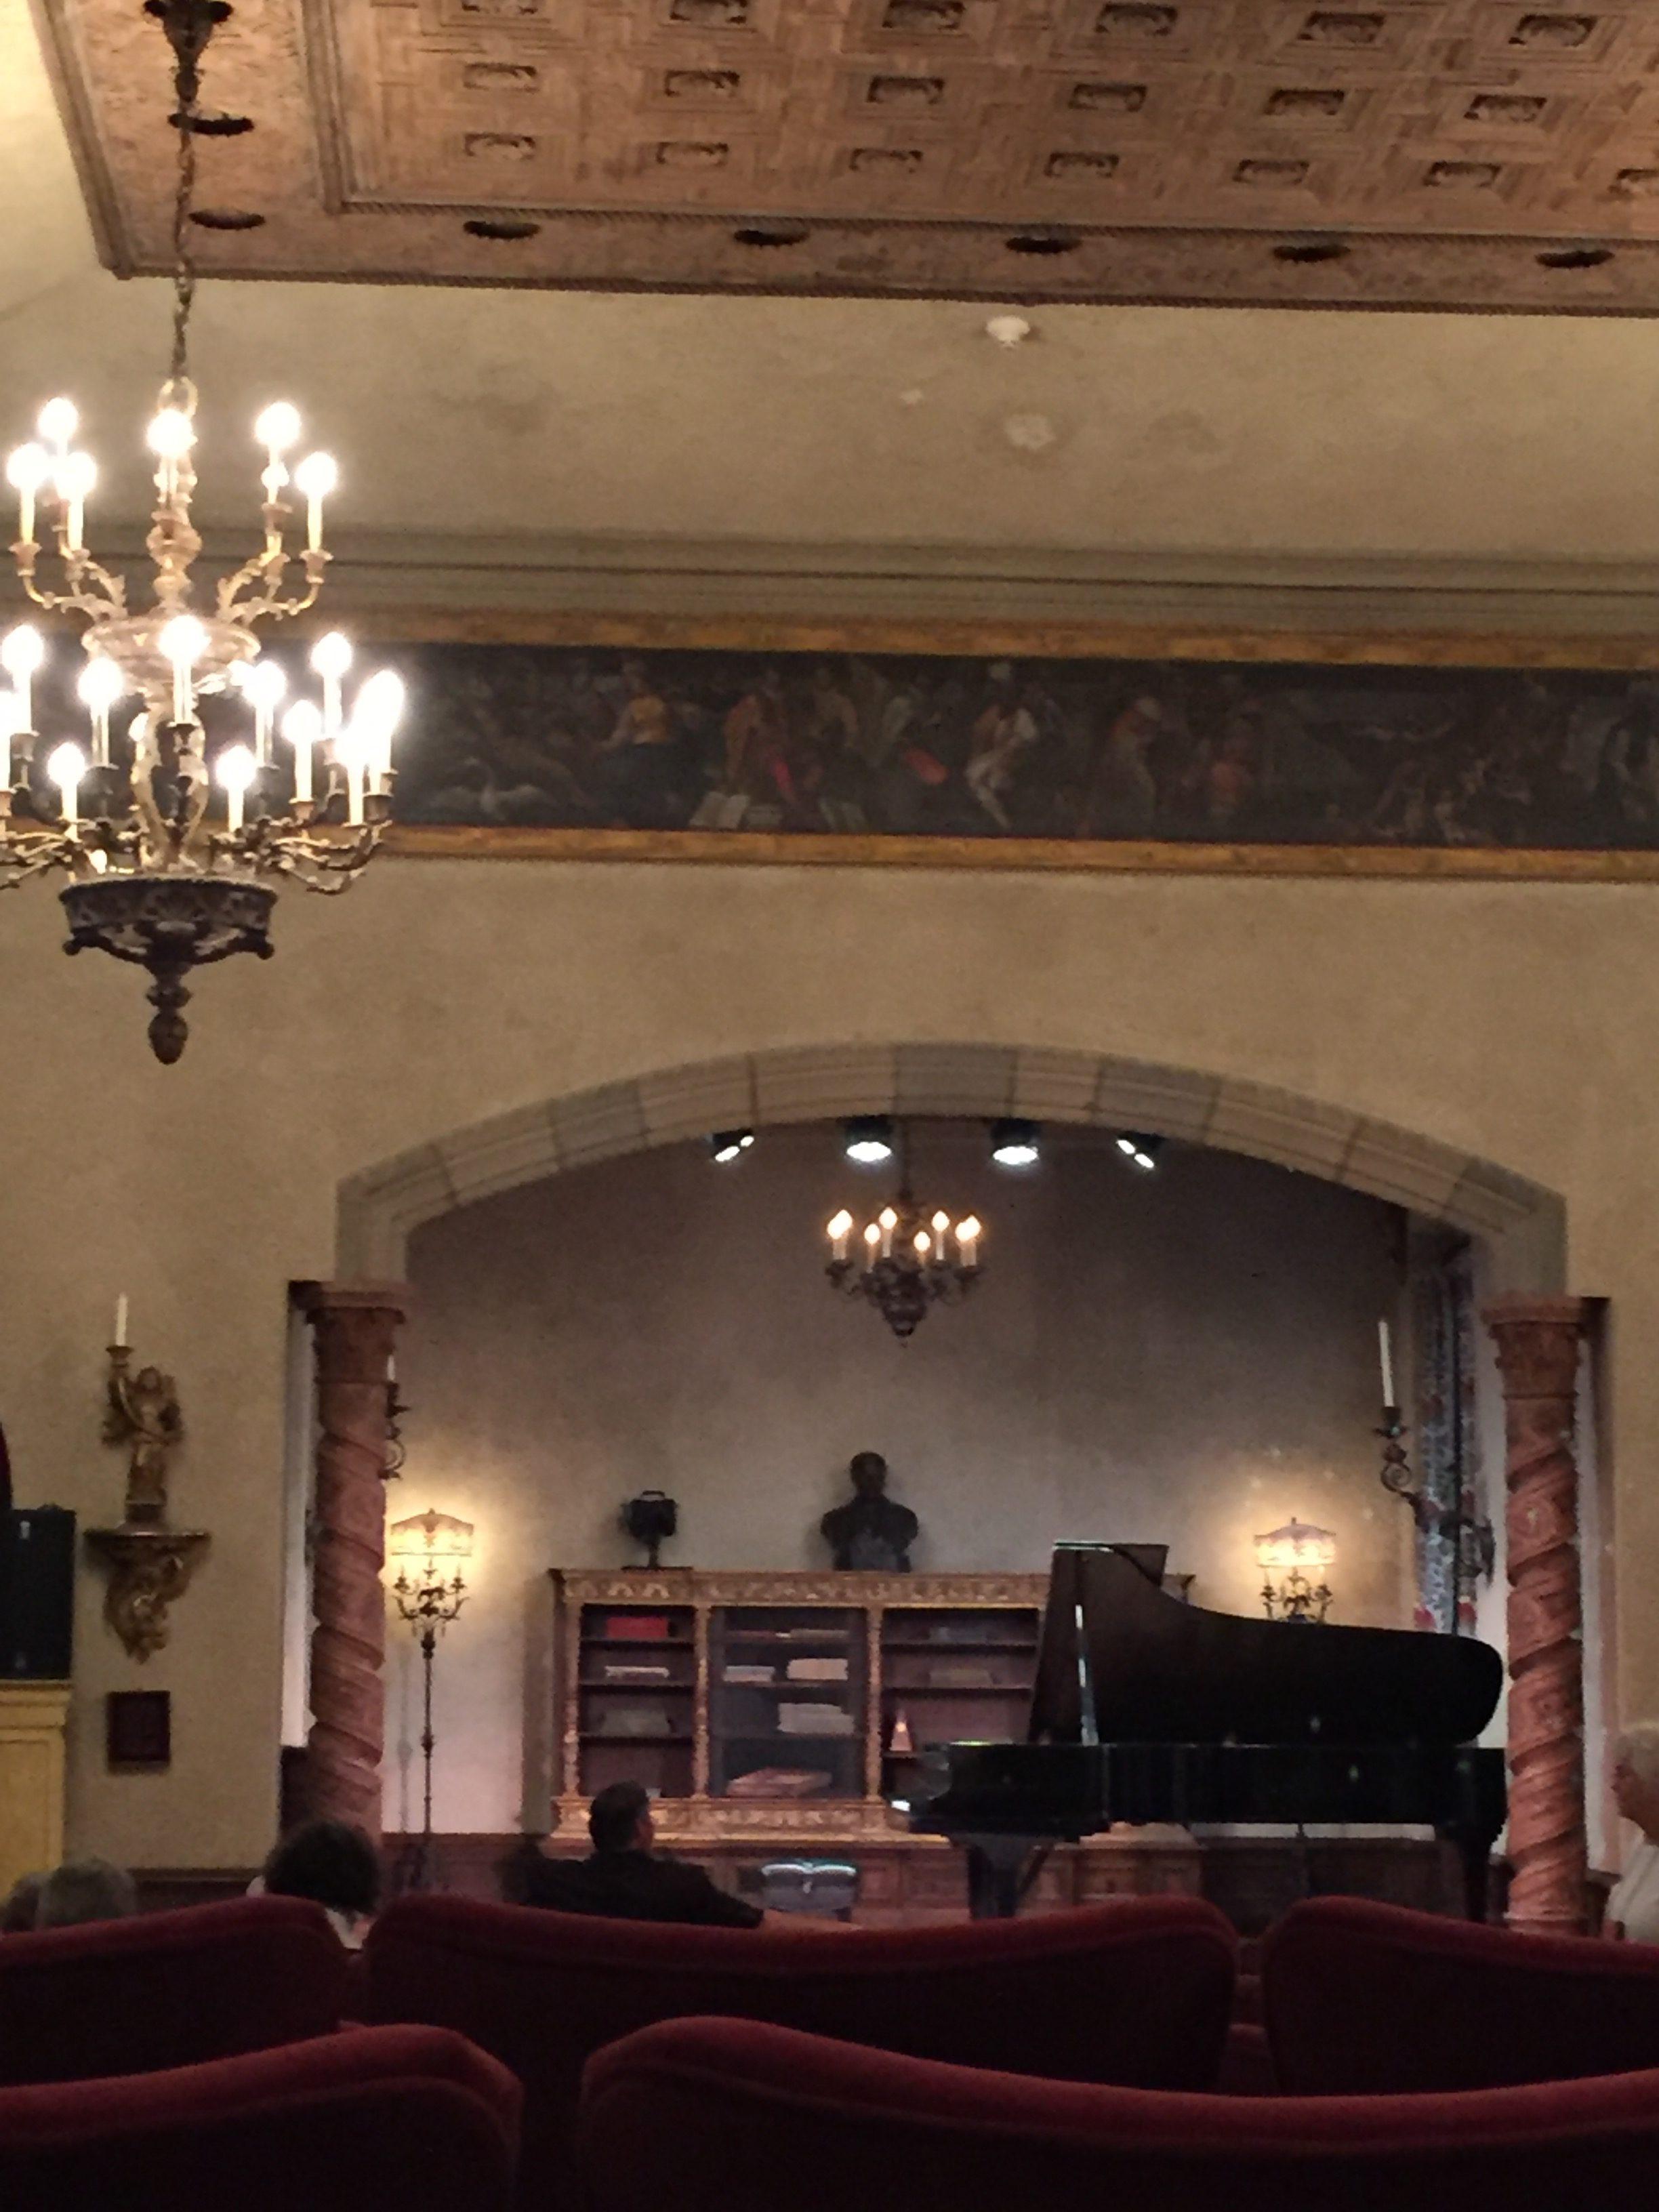 The music room at Caramoor Photo credit: M. Ciavardini